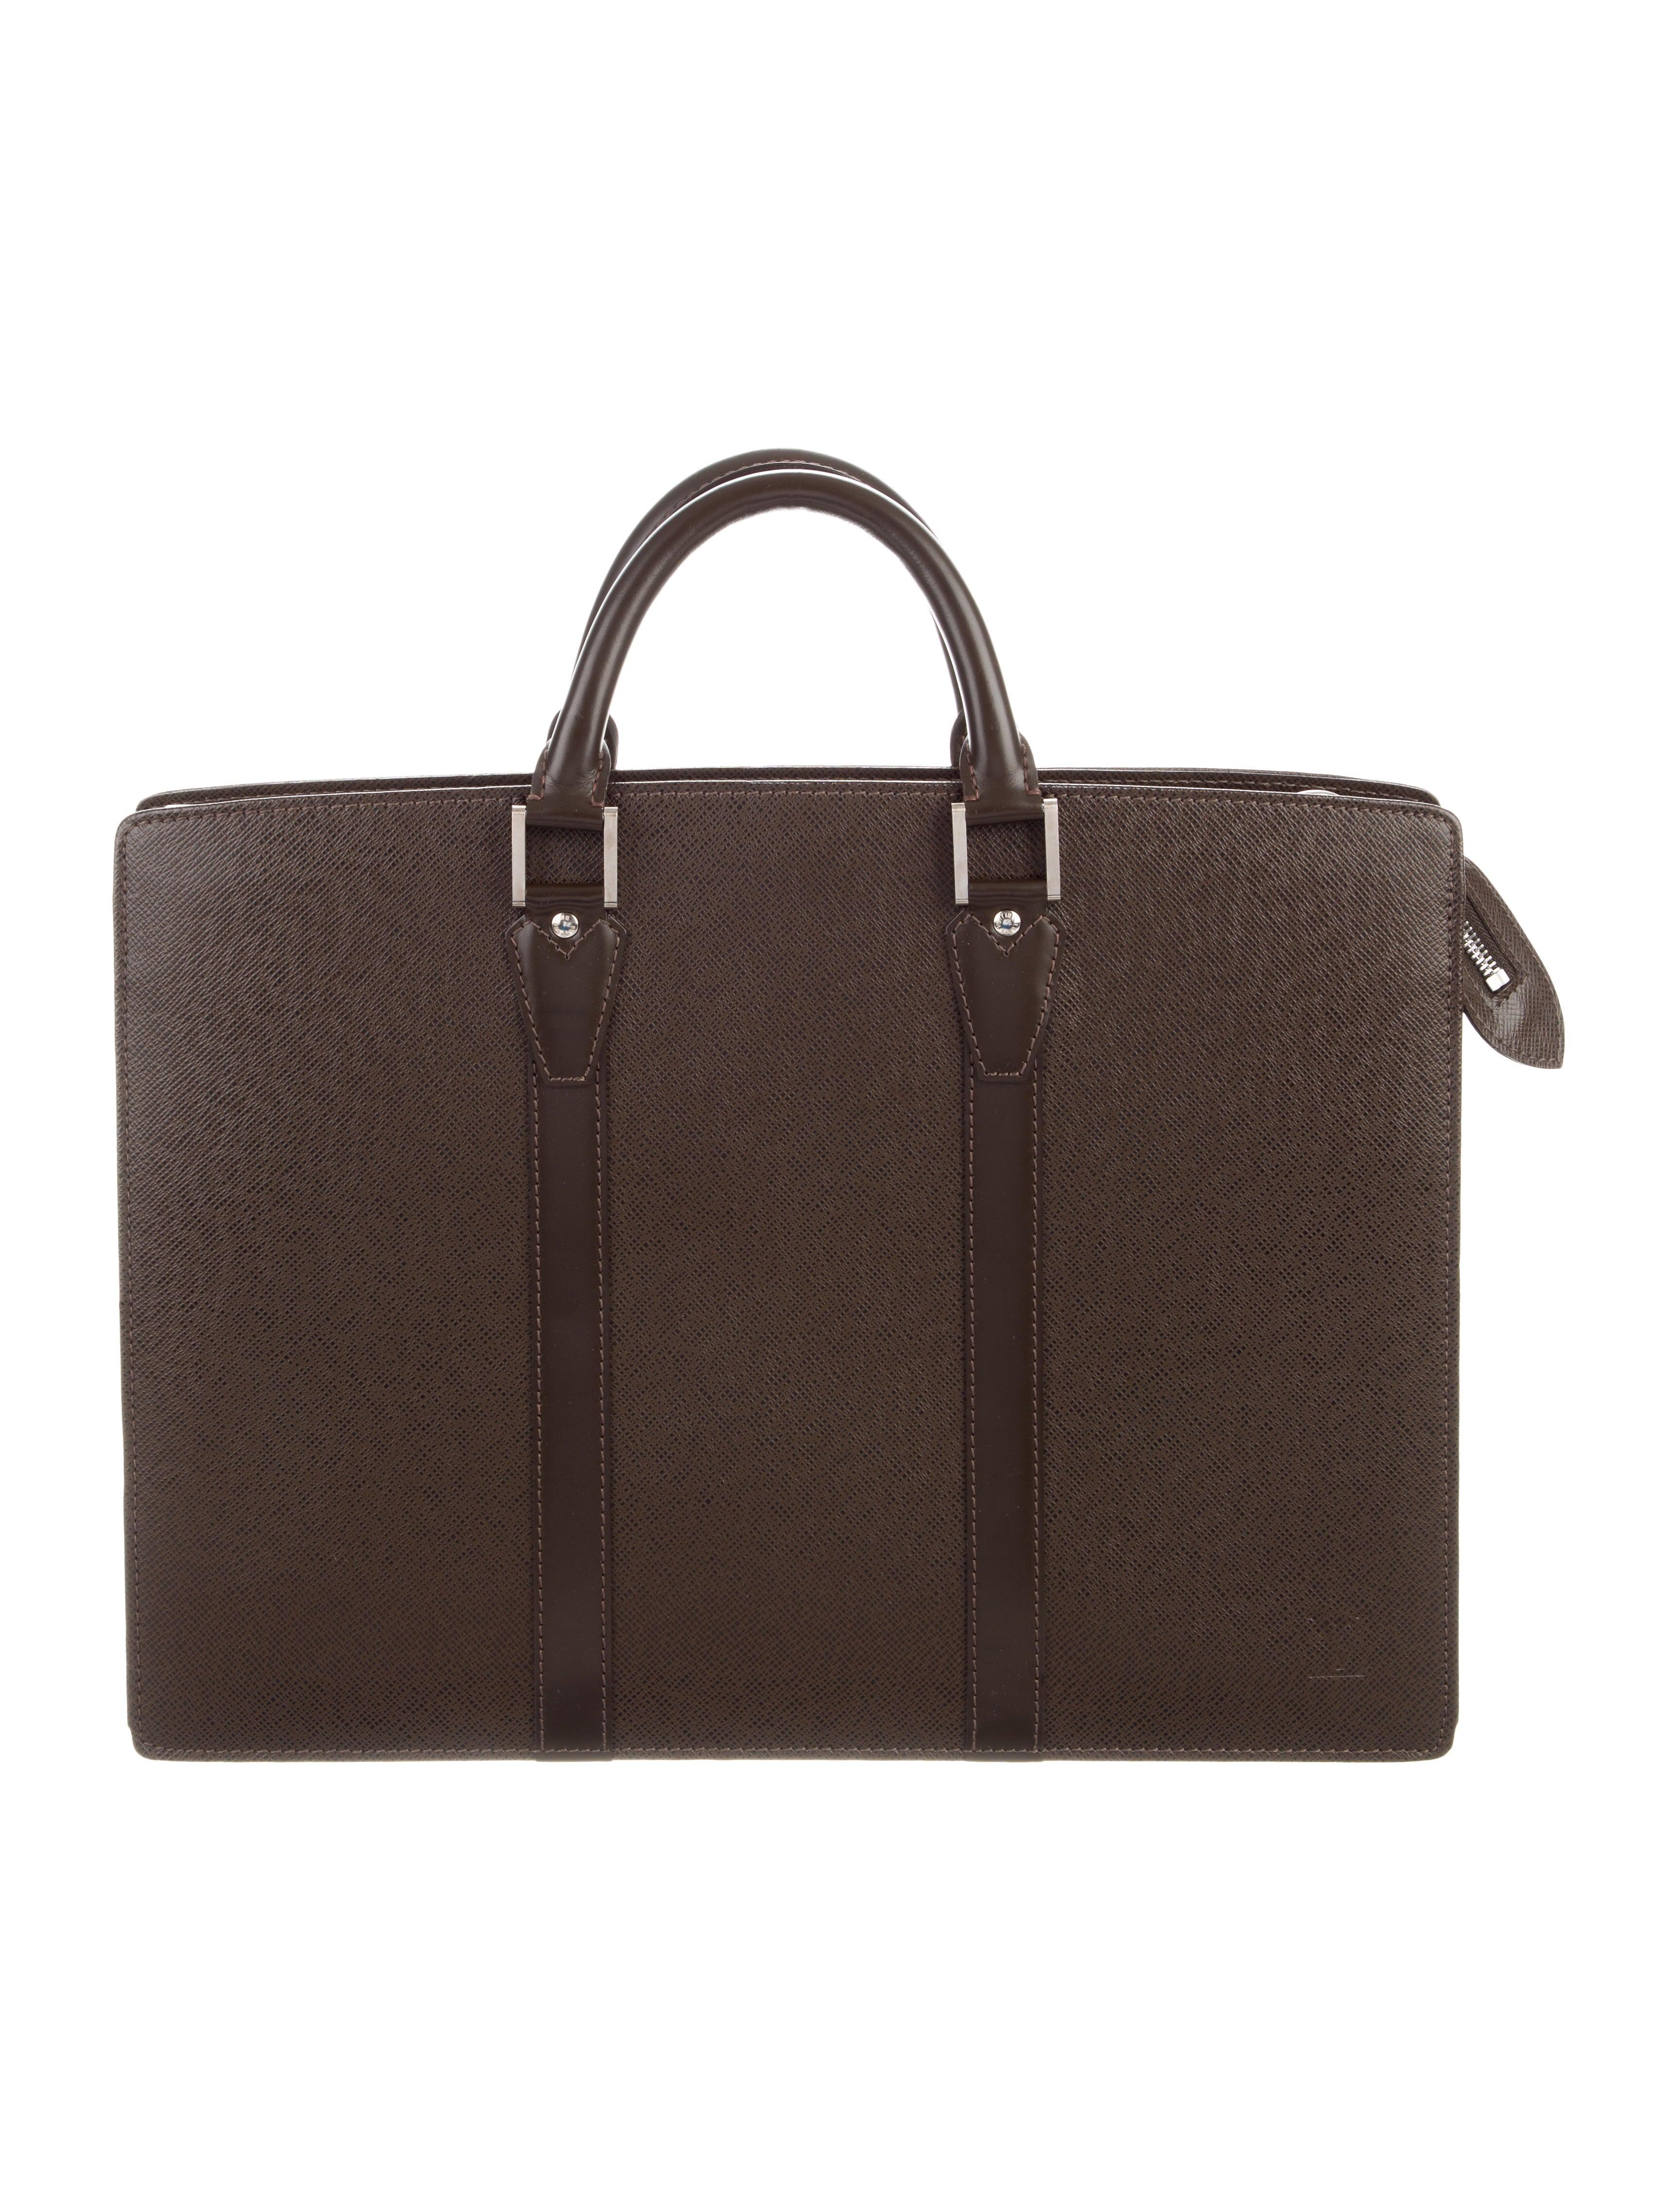 f1c7fa9bbfd7 Louis Vuitton Men | The RealReal